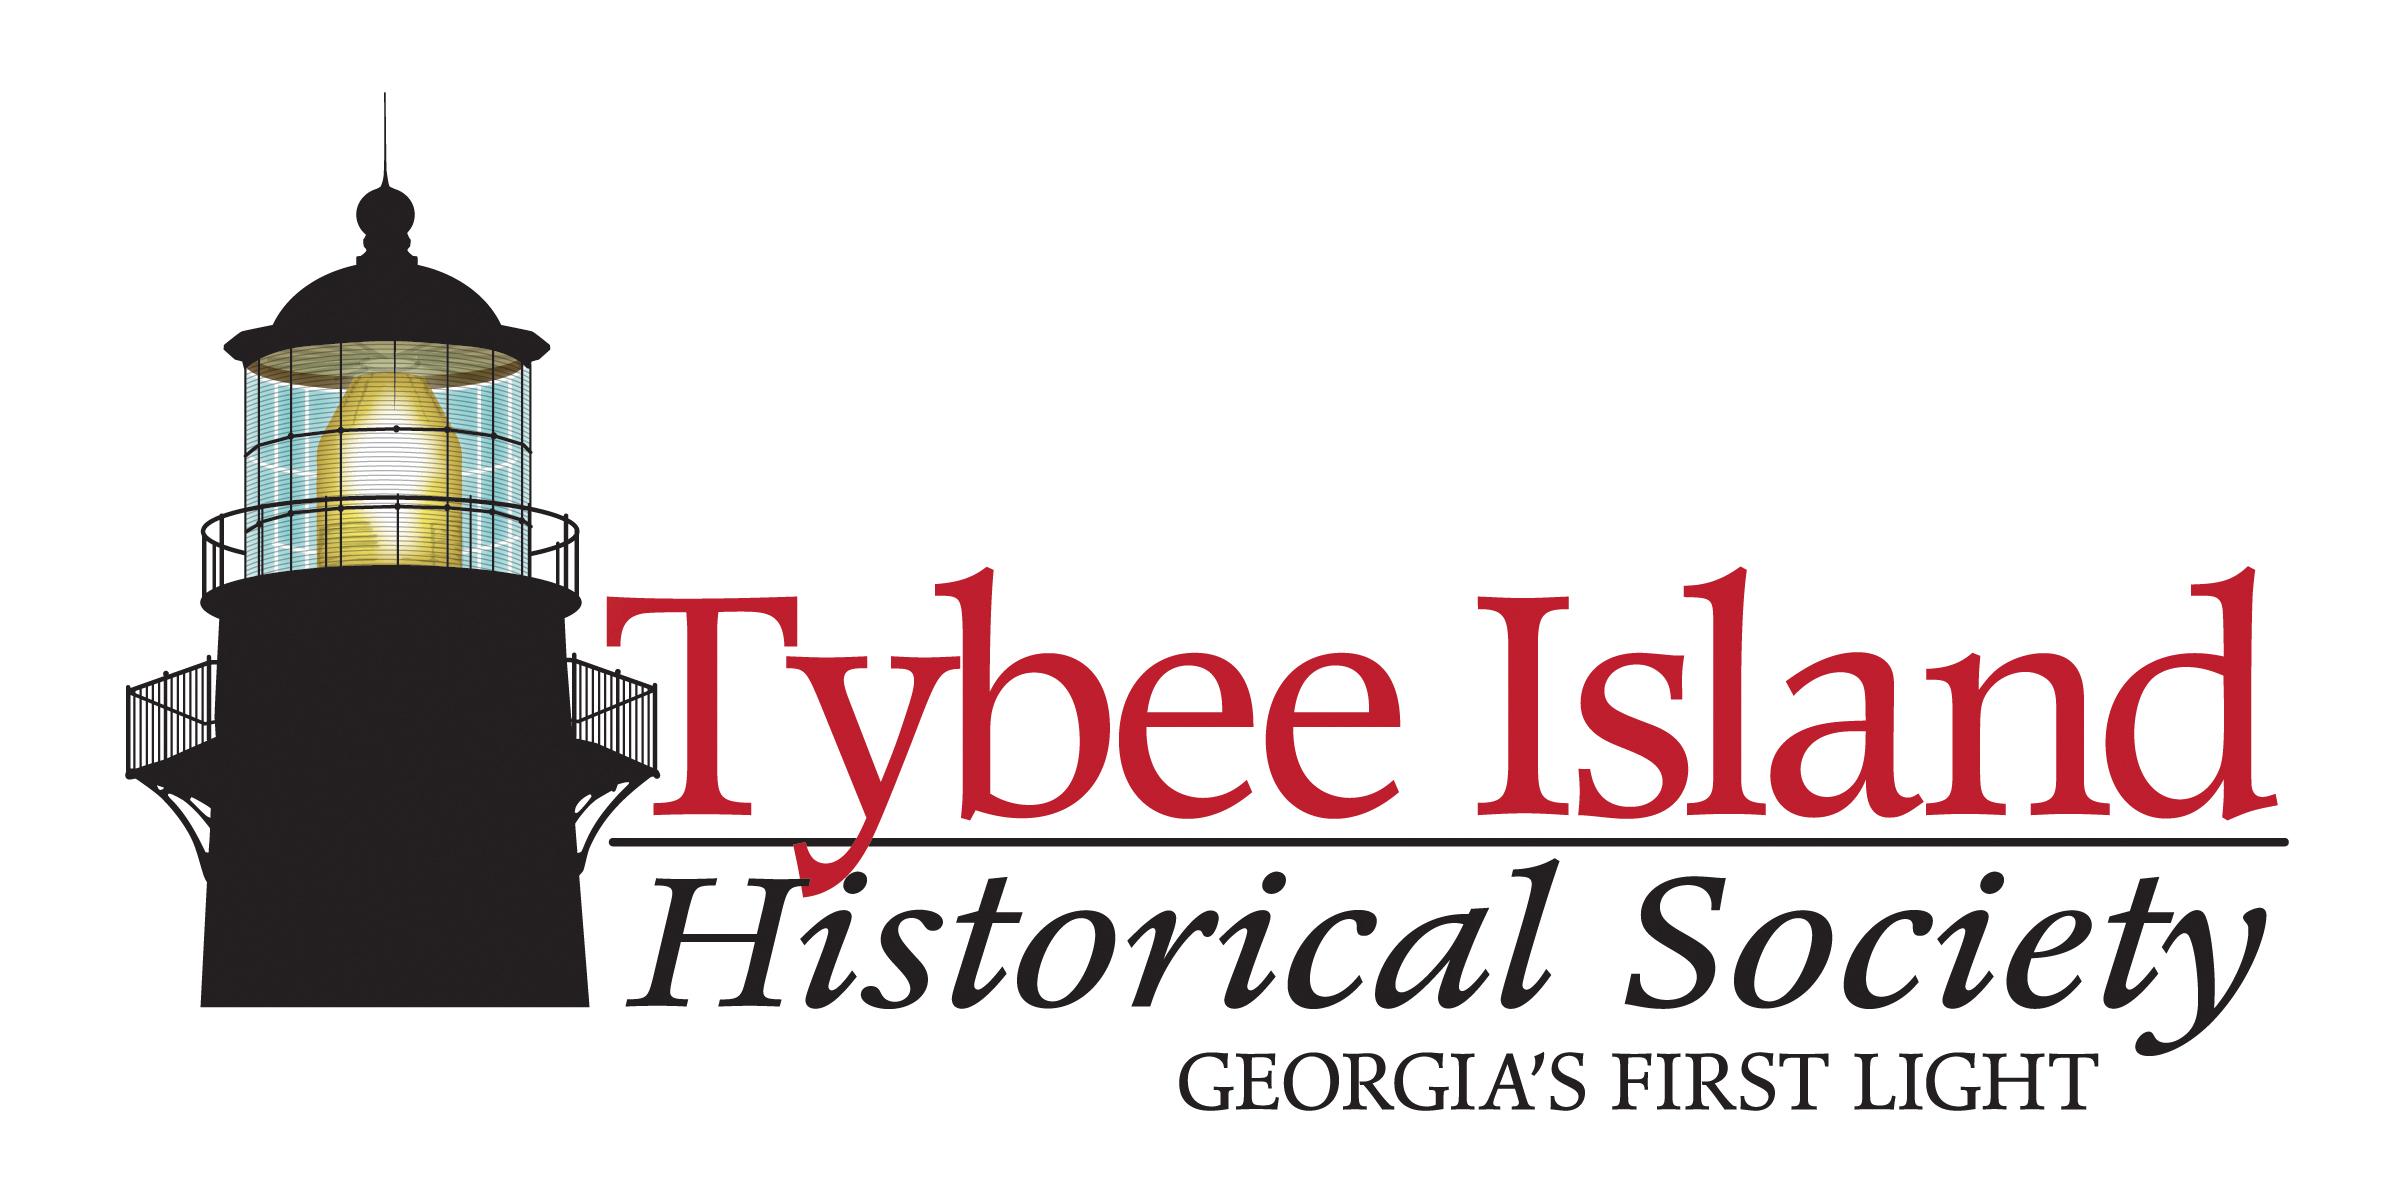 Tybee Island Historical Society